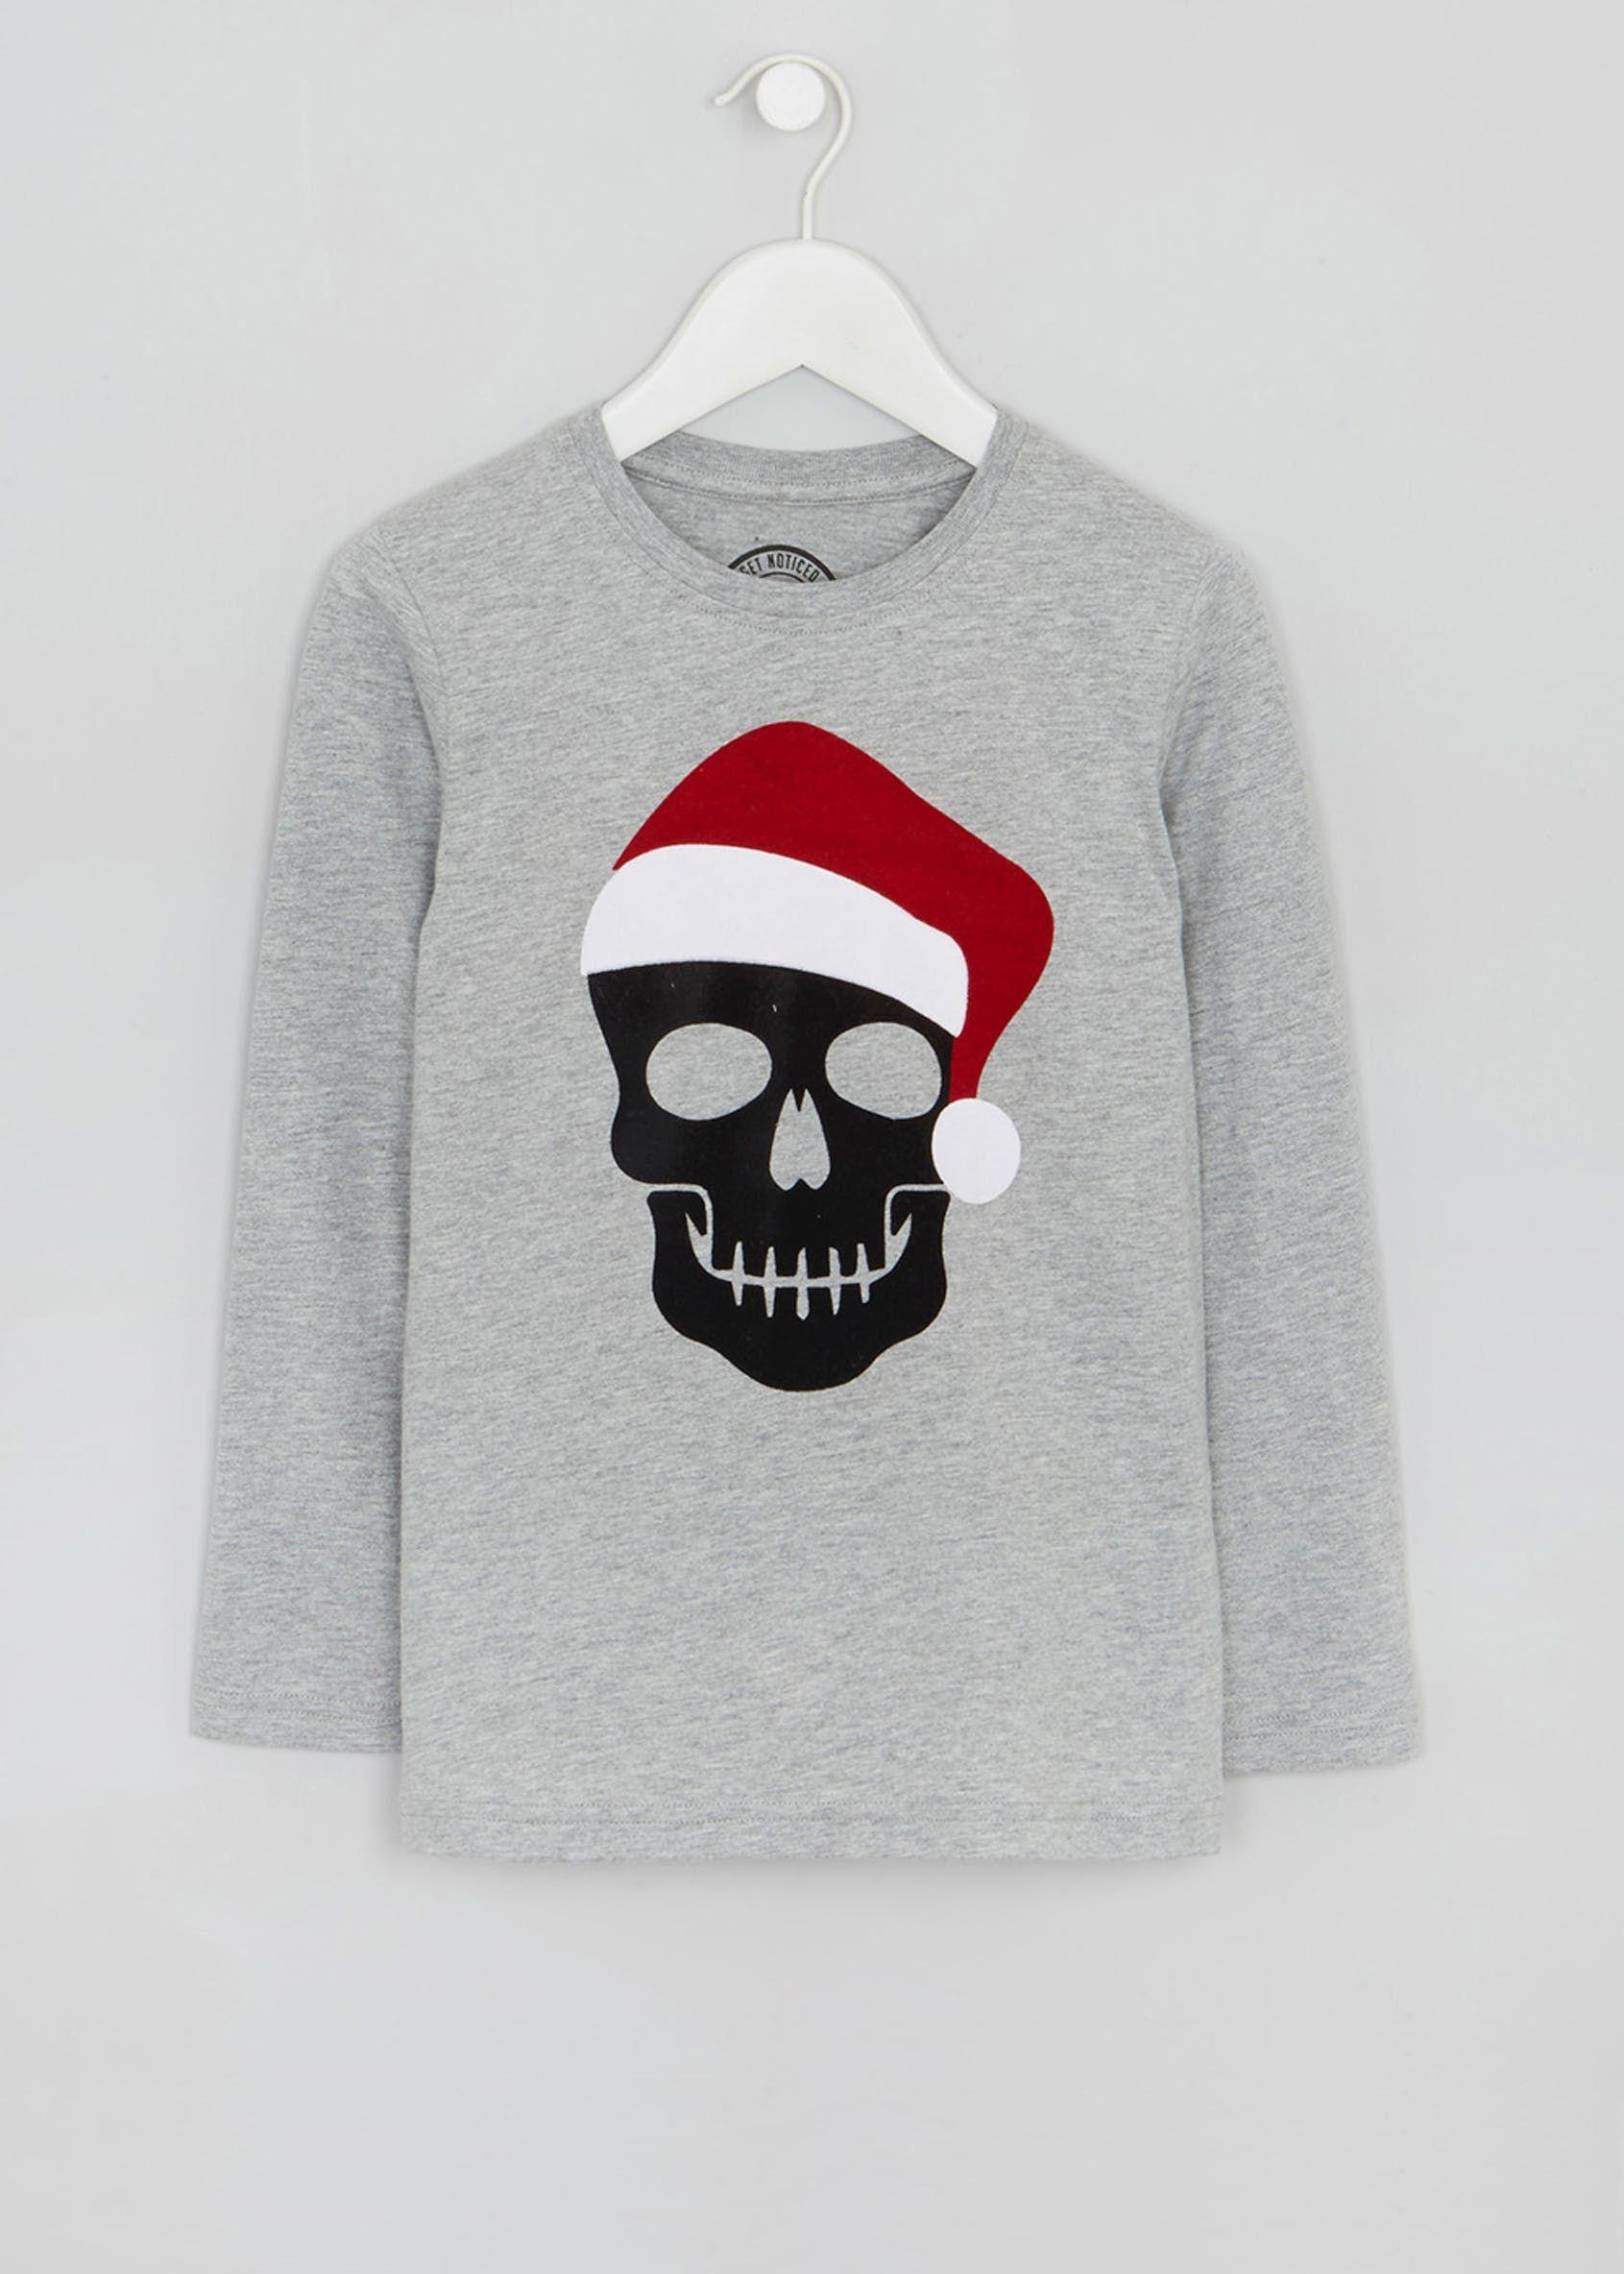 Boys santa skull christmas tshirt 413yrs grey with